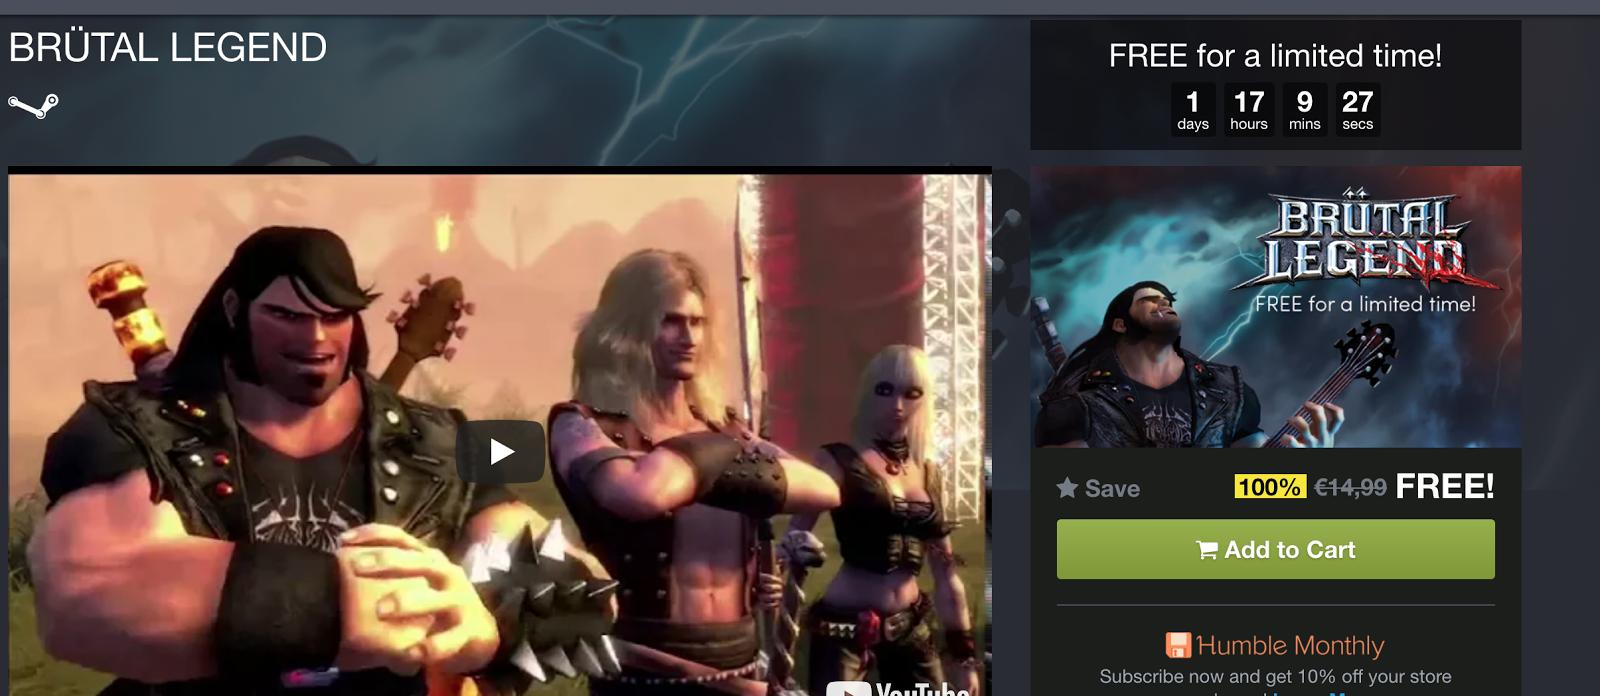 Consigue Brutal Legend gratis para ordenador